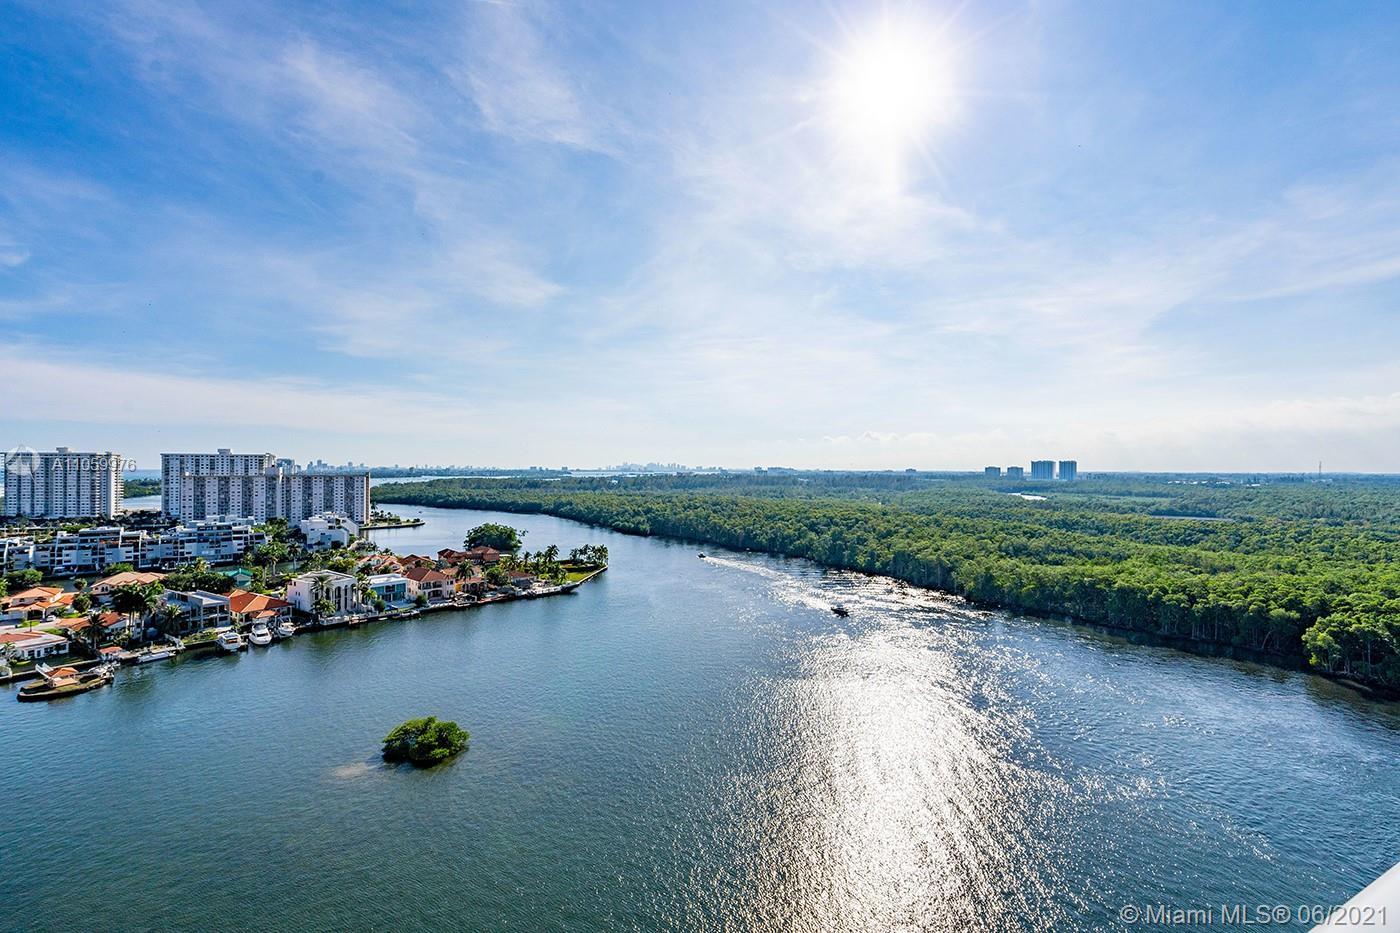 400 Sunny Isles #1804 - 400 Sunny Isles Blvd #1804, Sunny Isles Beach, FL 33160